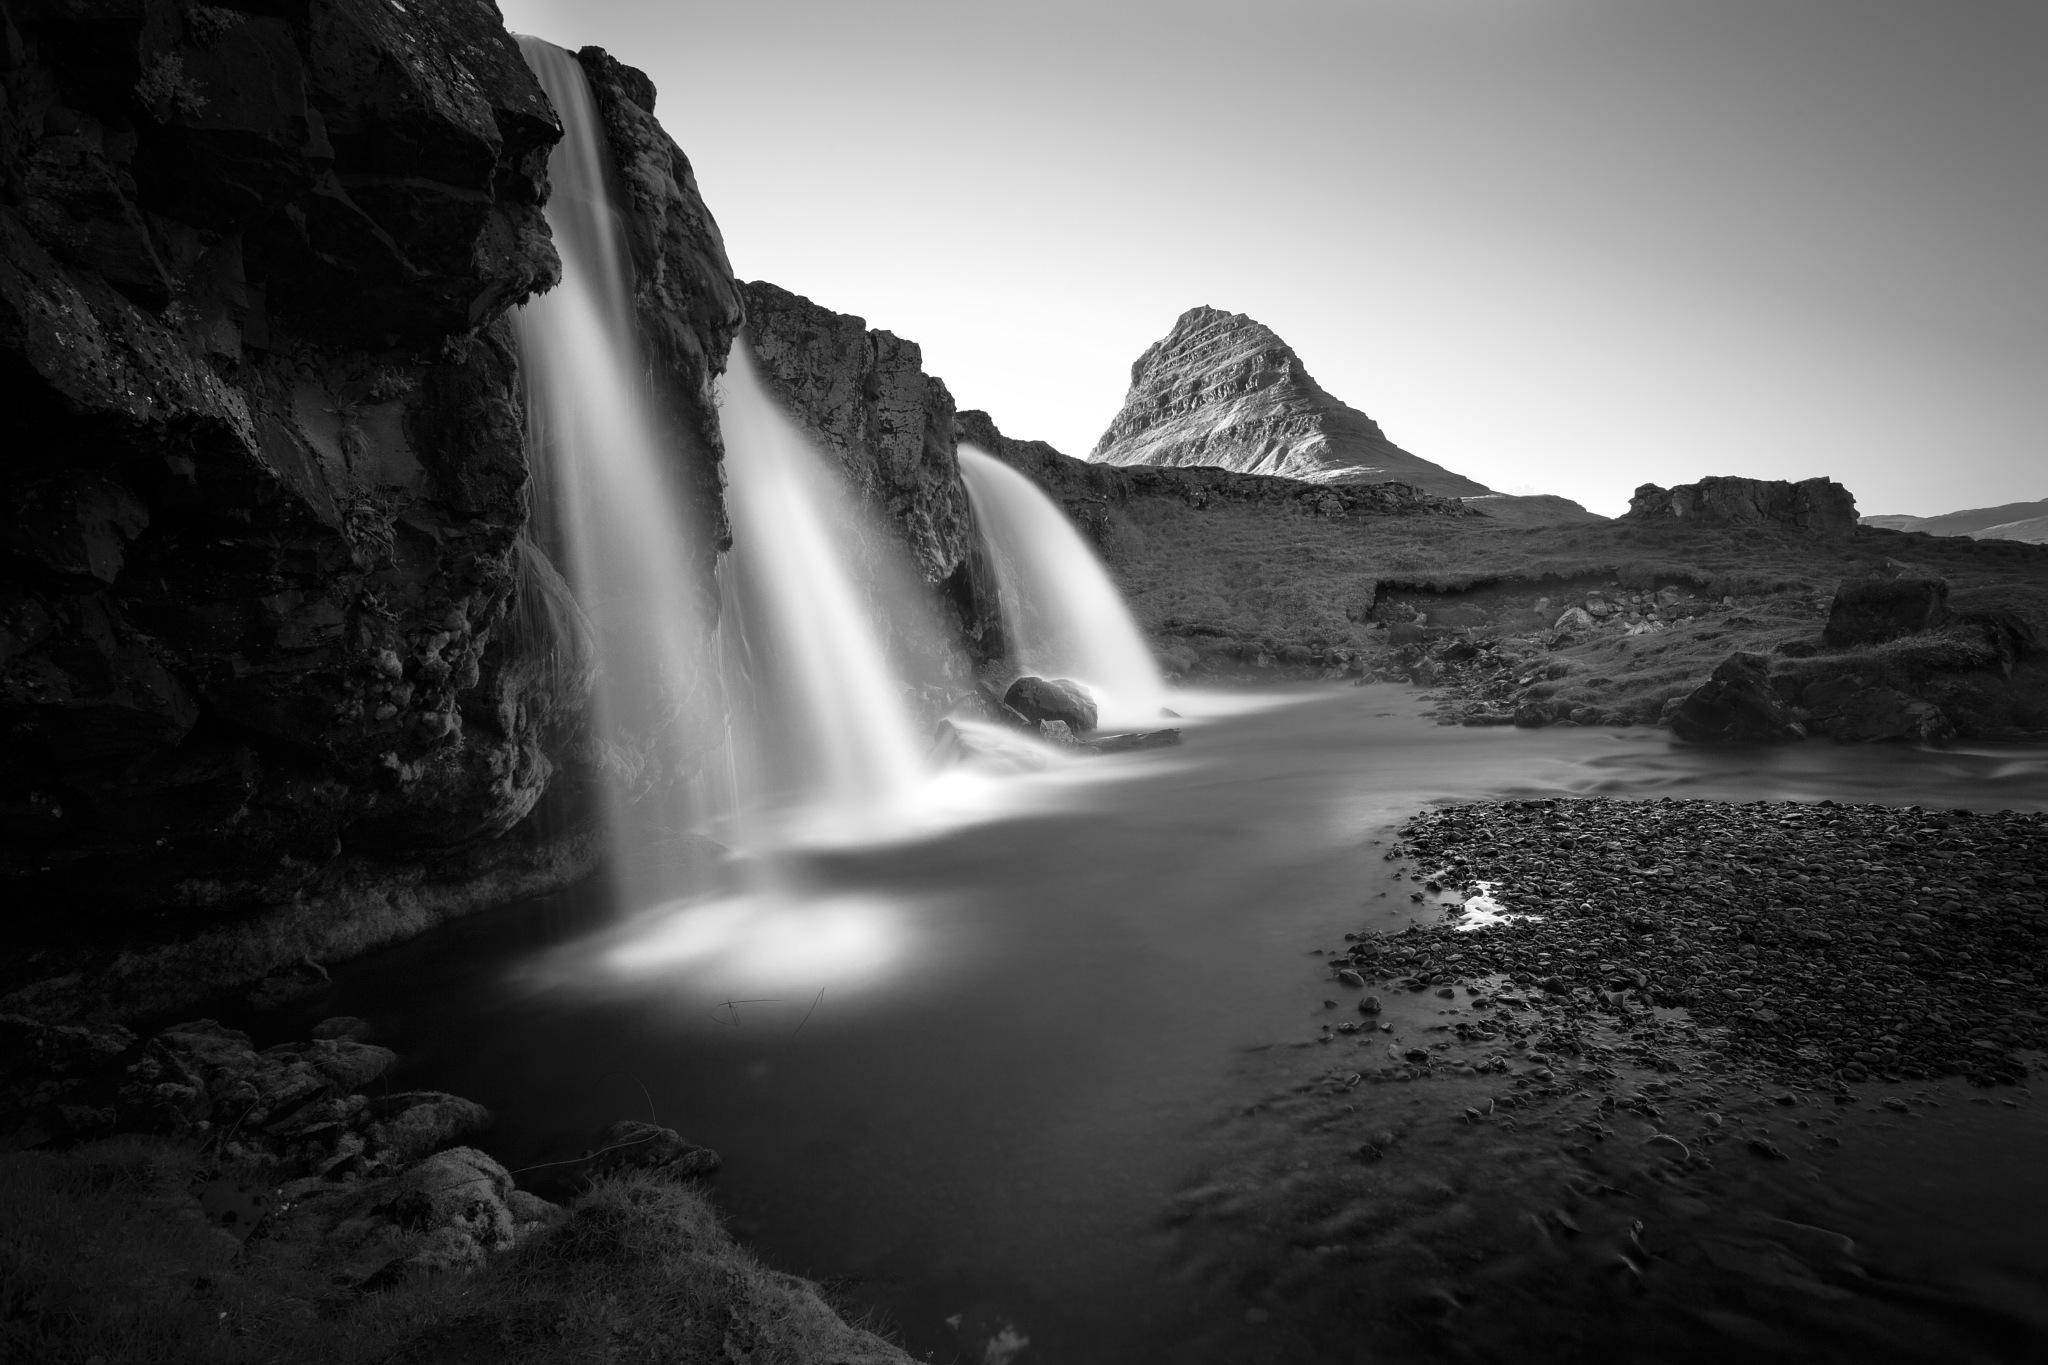 kirkjufellsfoss by LidiaVanhamme